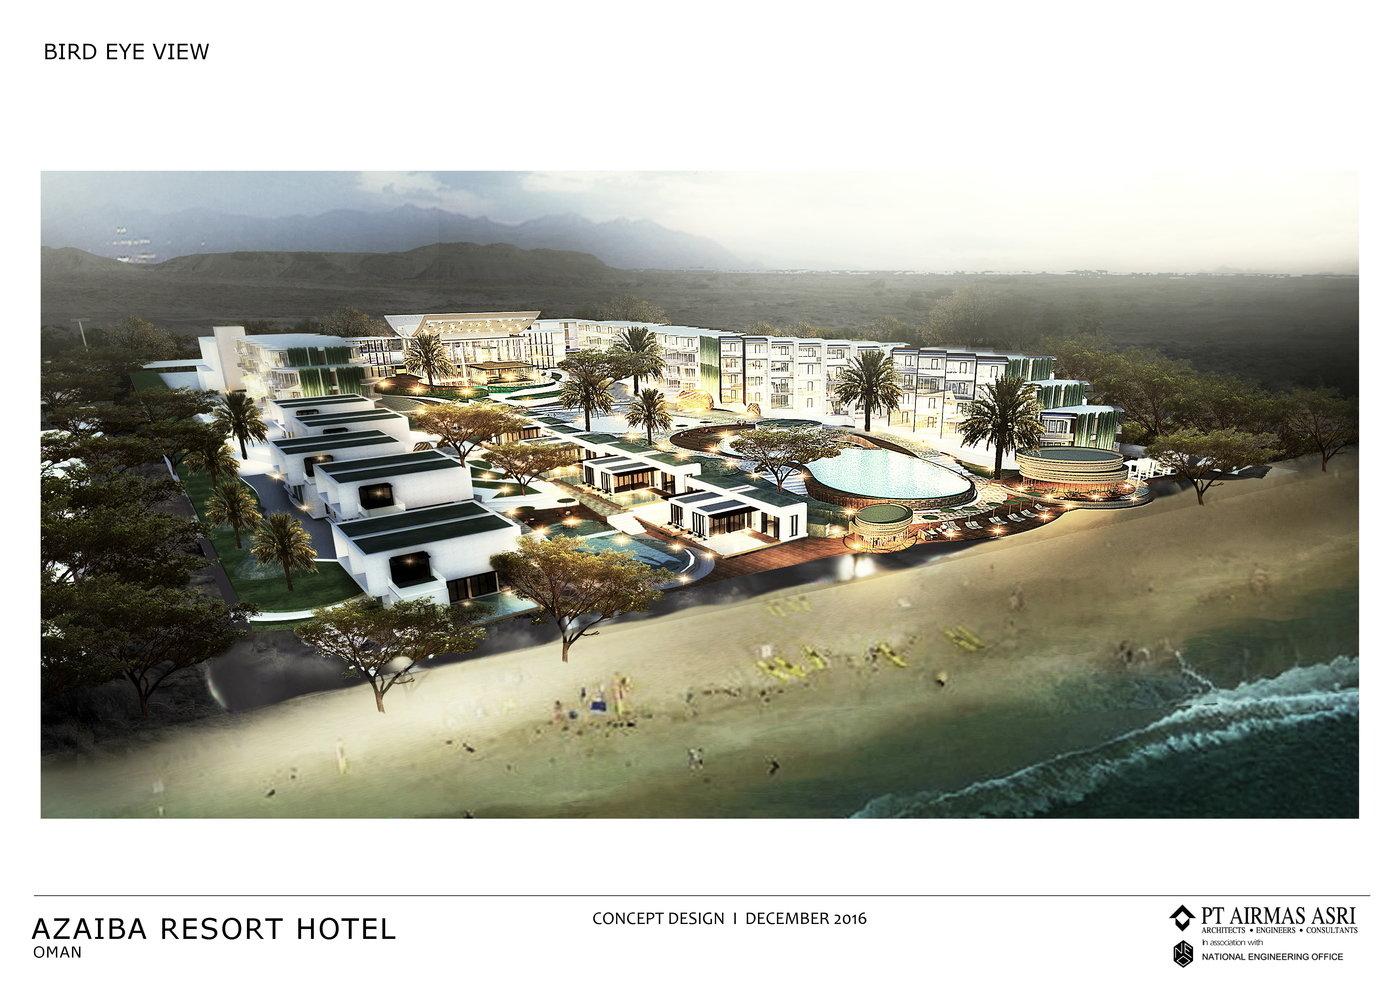 Hilton Azaiba North Hotel By Michael JS At Coroflot